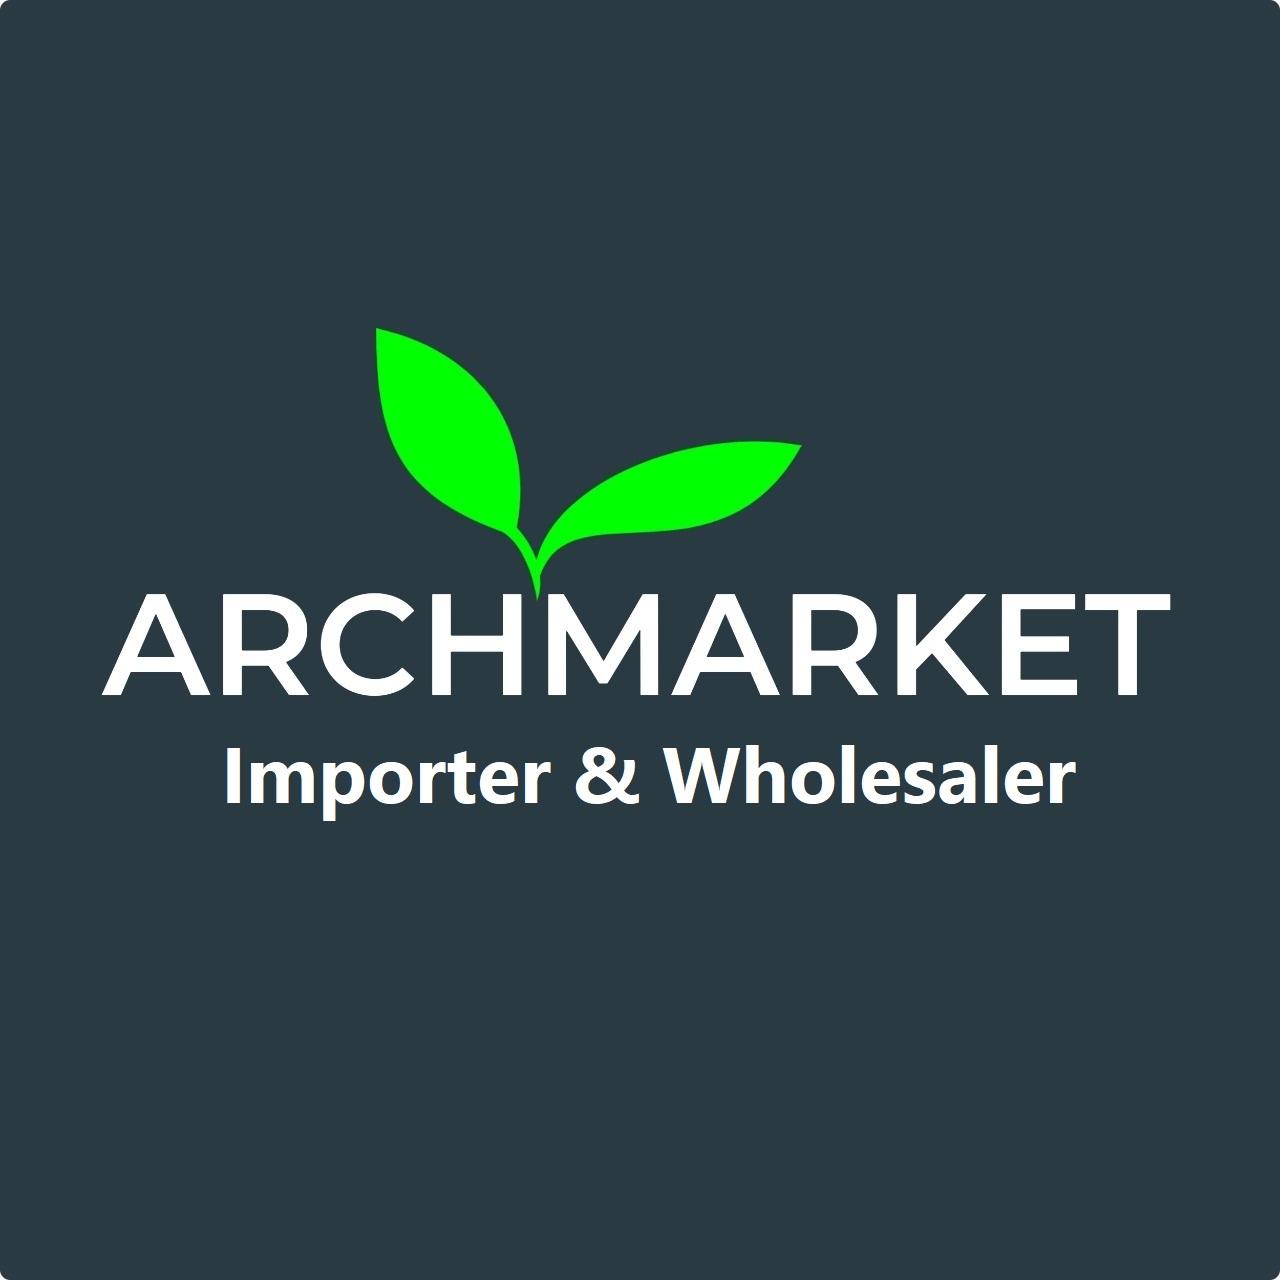 arch market logo